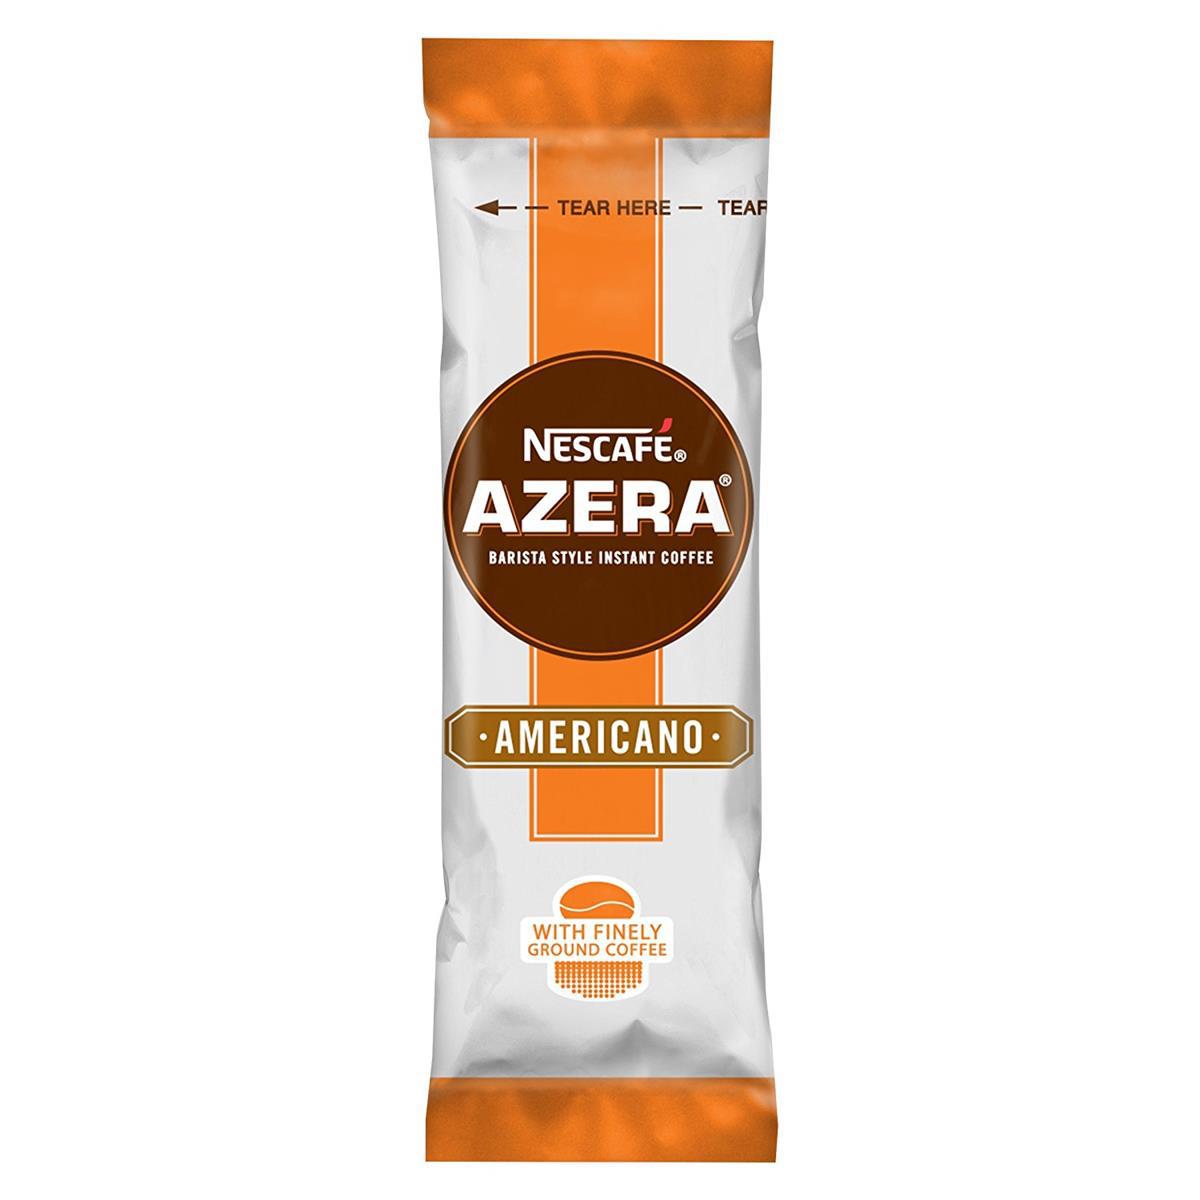 Nescafe Azera Americano Instant Coffee Sachets 2g Ref 12356930 [Pack 200]